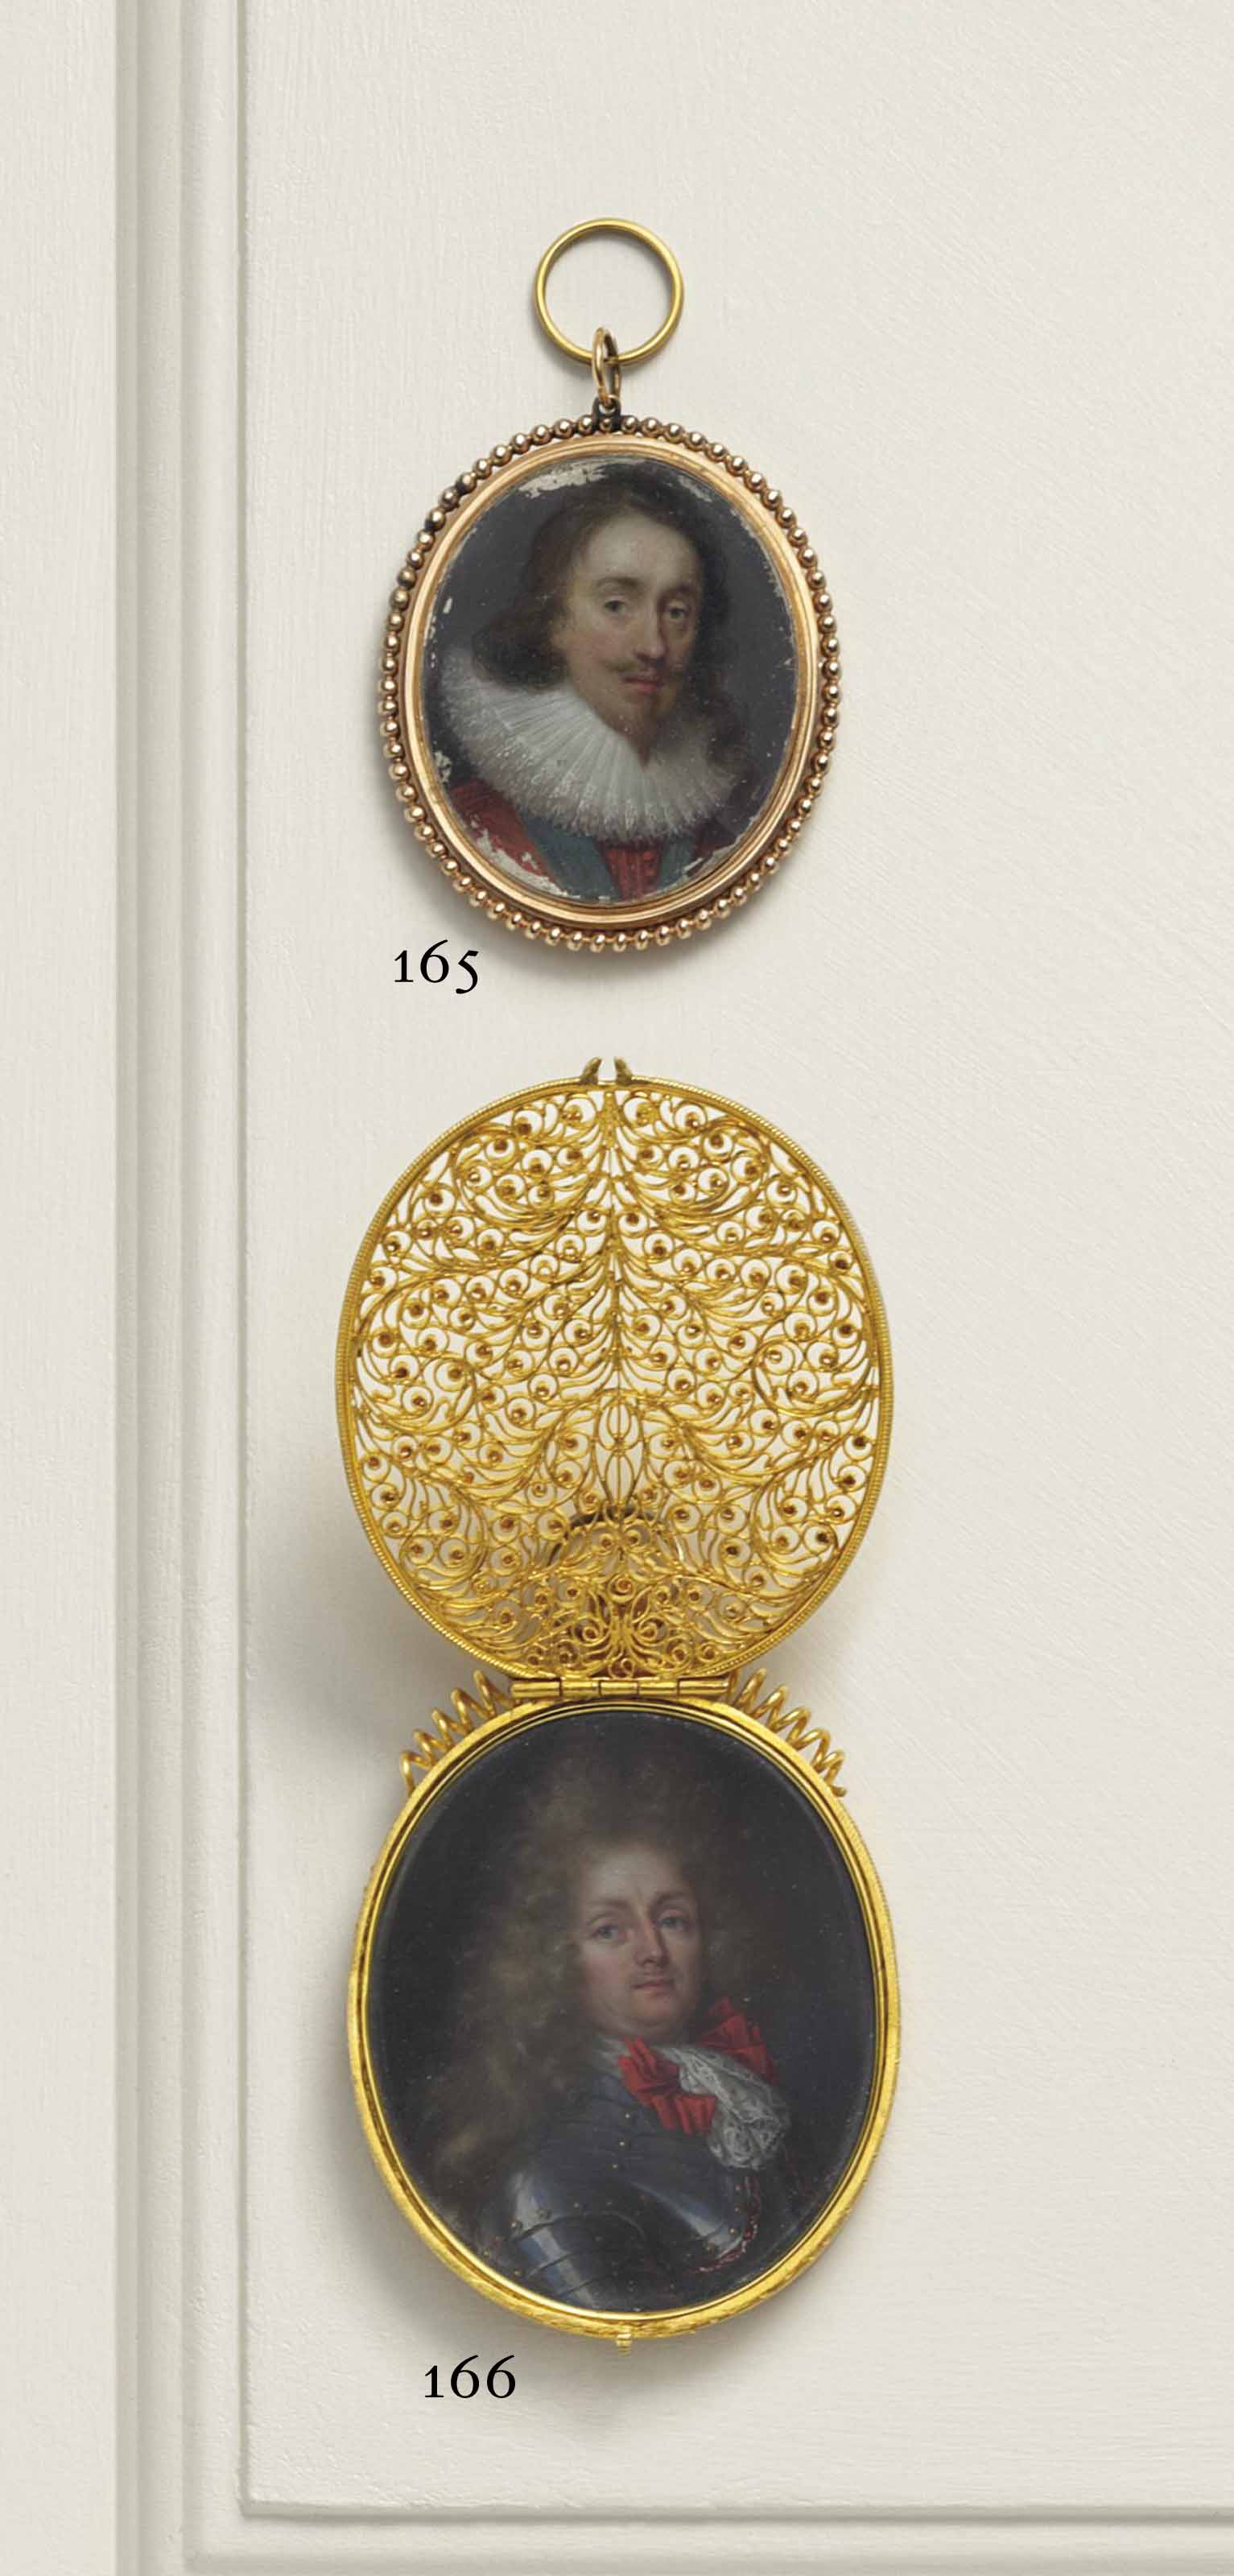 ATTRIBUTED TO CORNELIS JONSON VAN CEULEN (ANGLO-DUTCH, 1593 - 1661/1662)